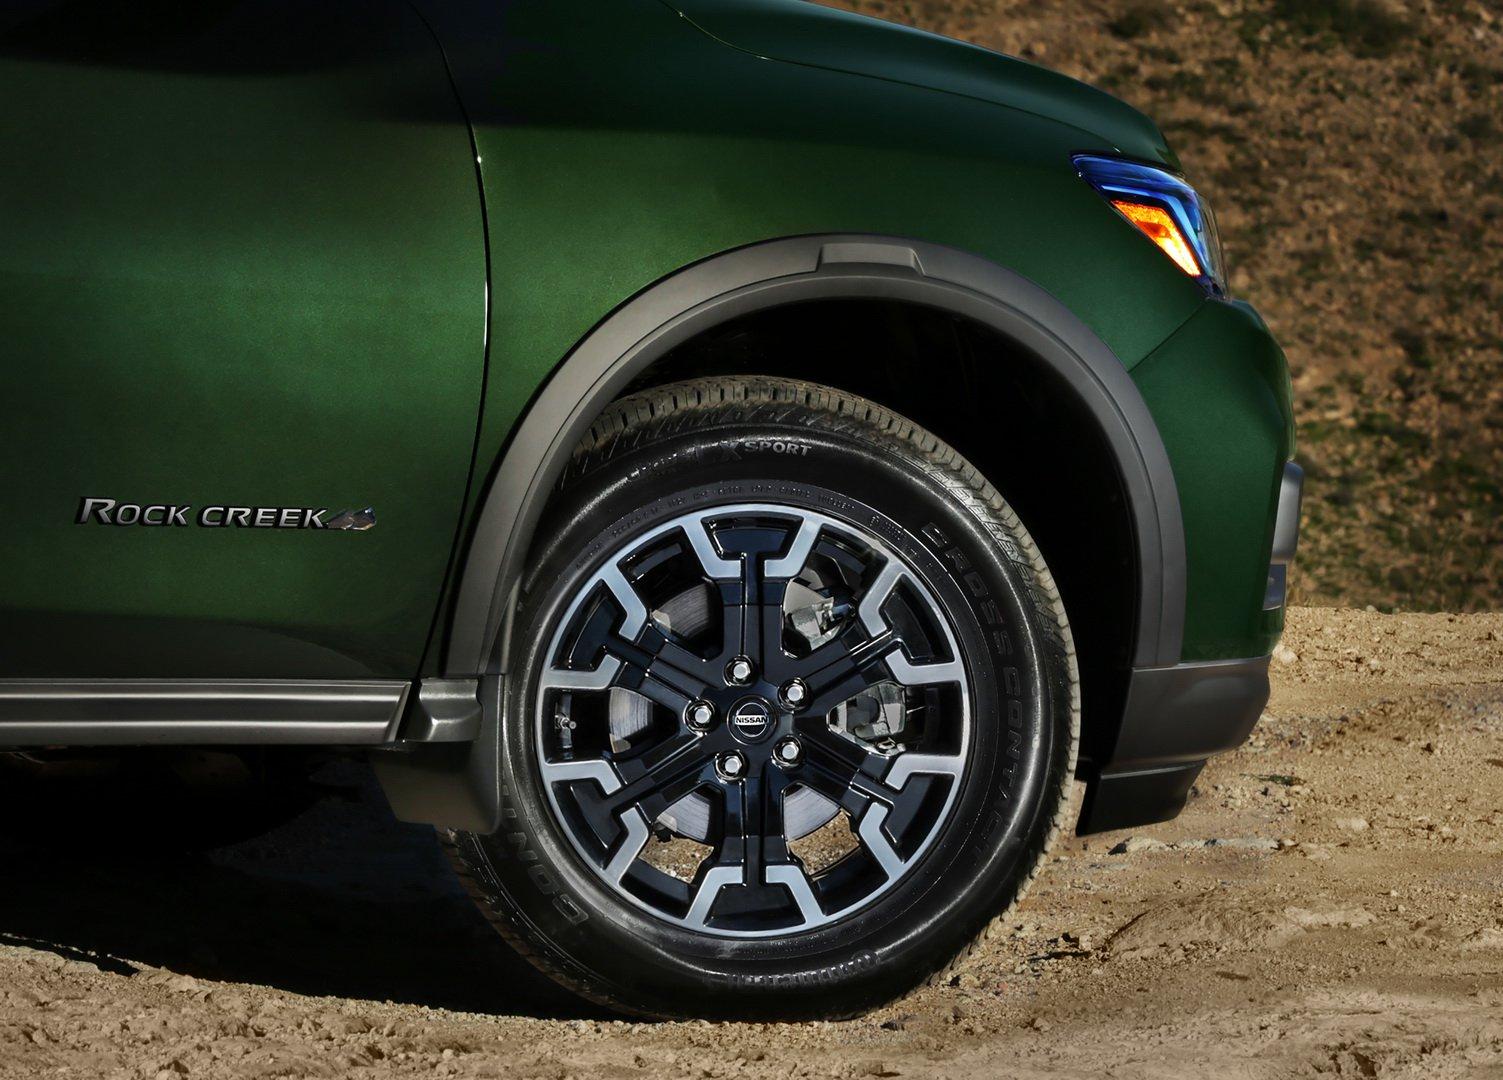 Nissan Pathfinder Rock Creek Edition 2019 (13)